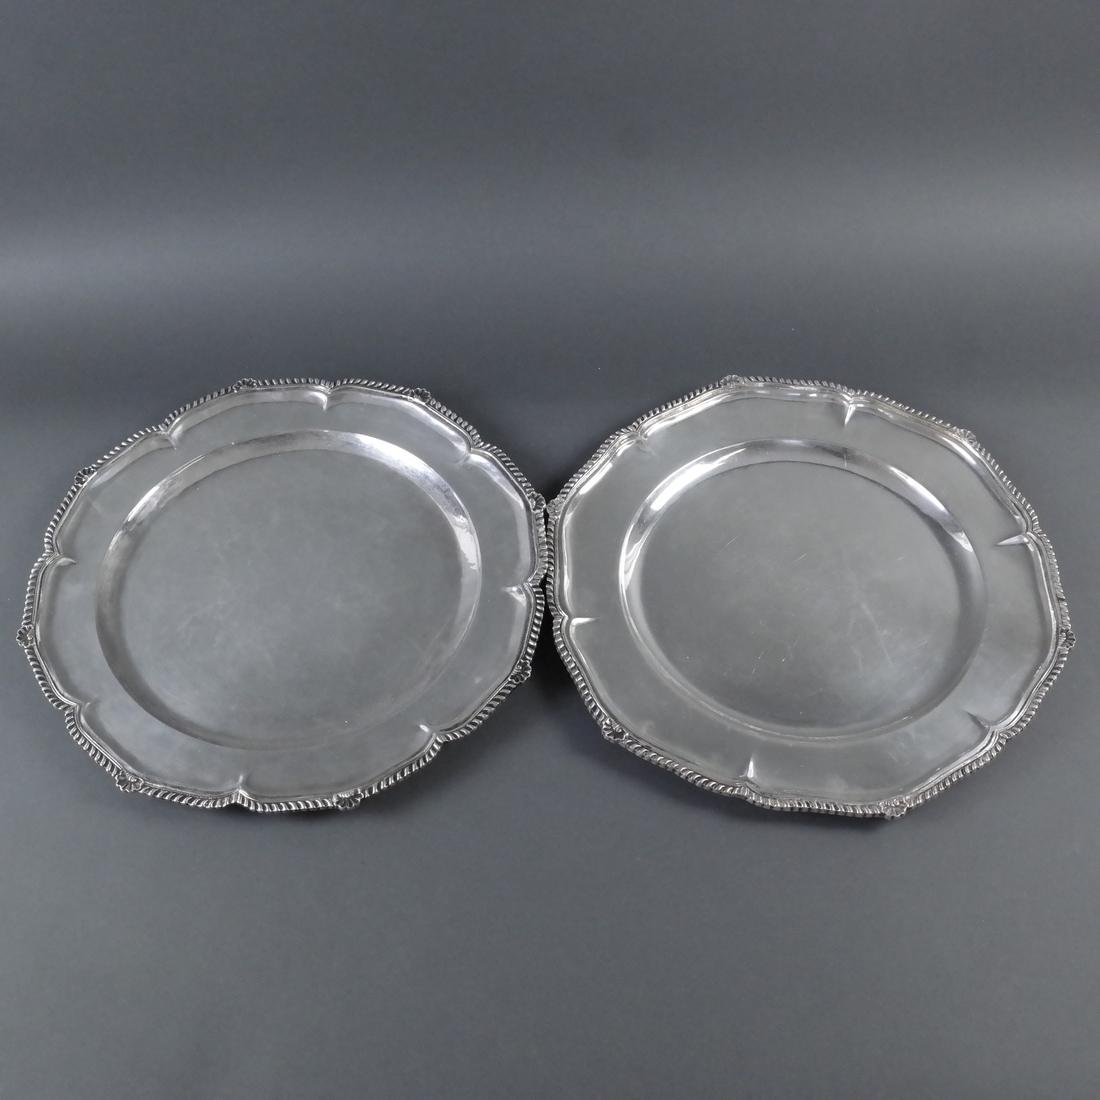 4 .900 Standard Silver Graduated Platters - 6